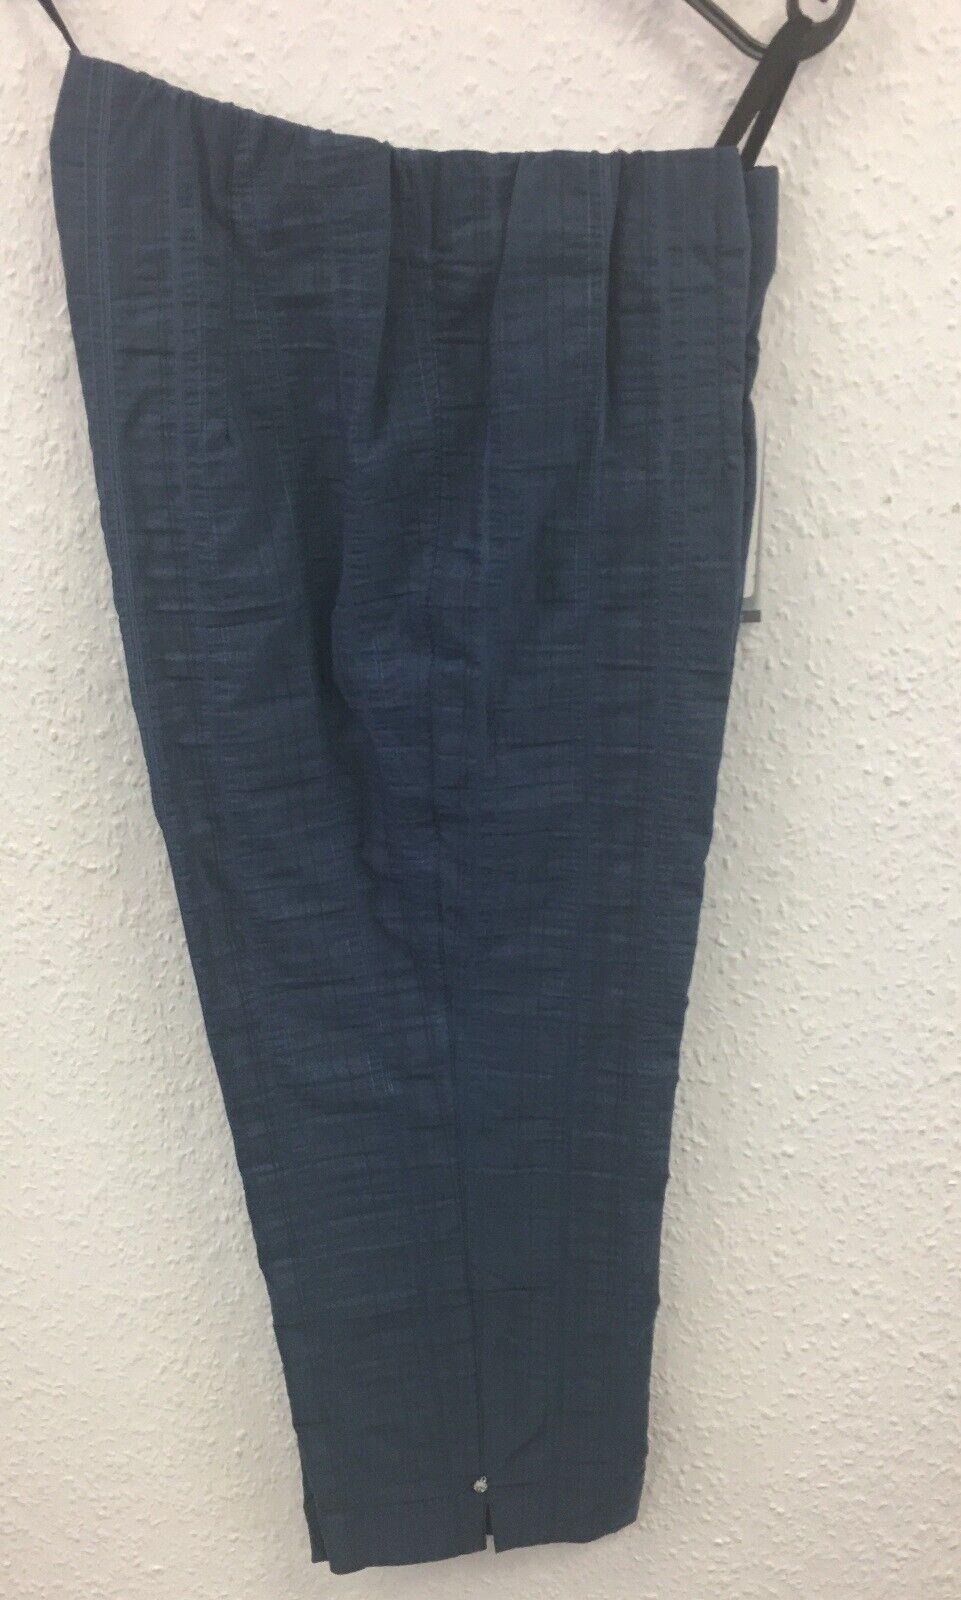 Kj Brand Capri Hose Susie blau Baumwolle Gummibund Damen Sommerhose Wash & Go